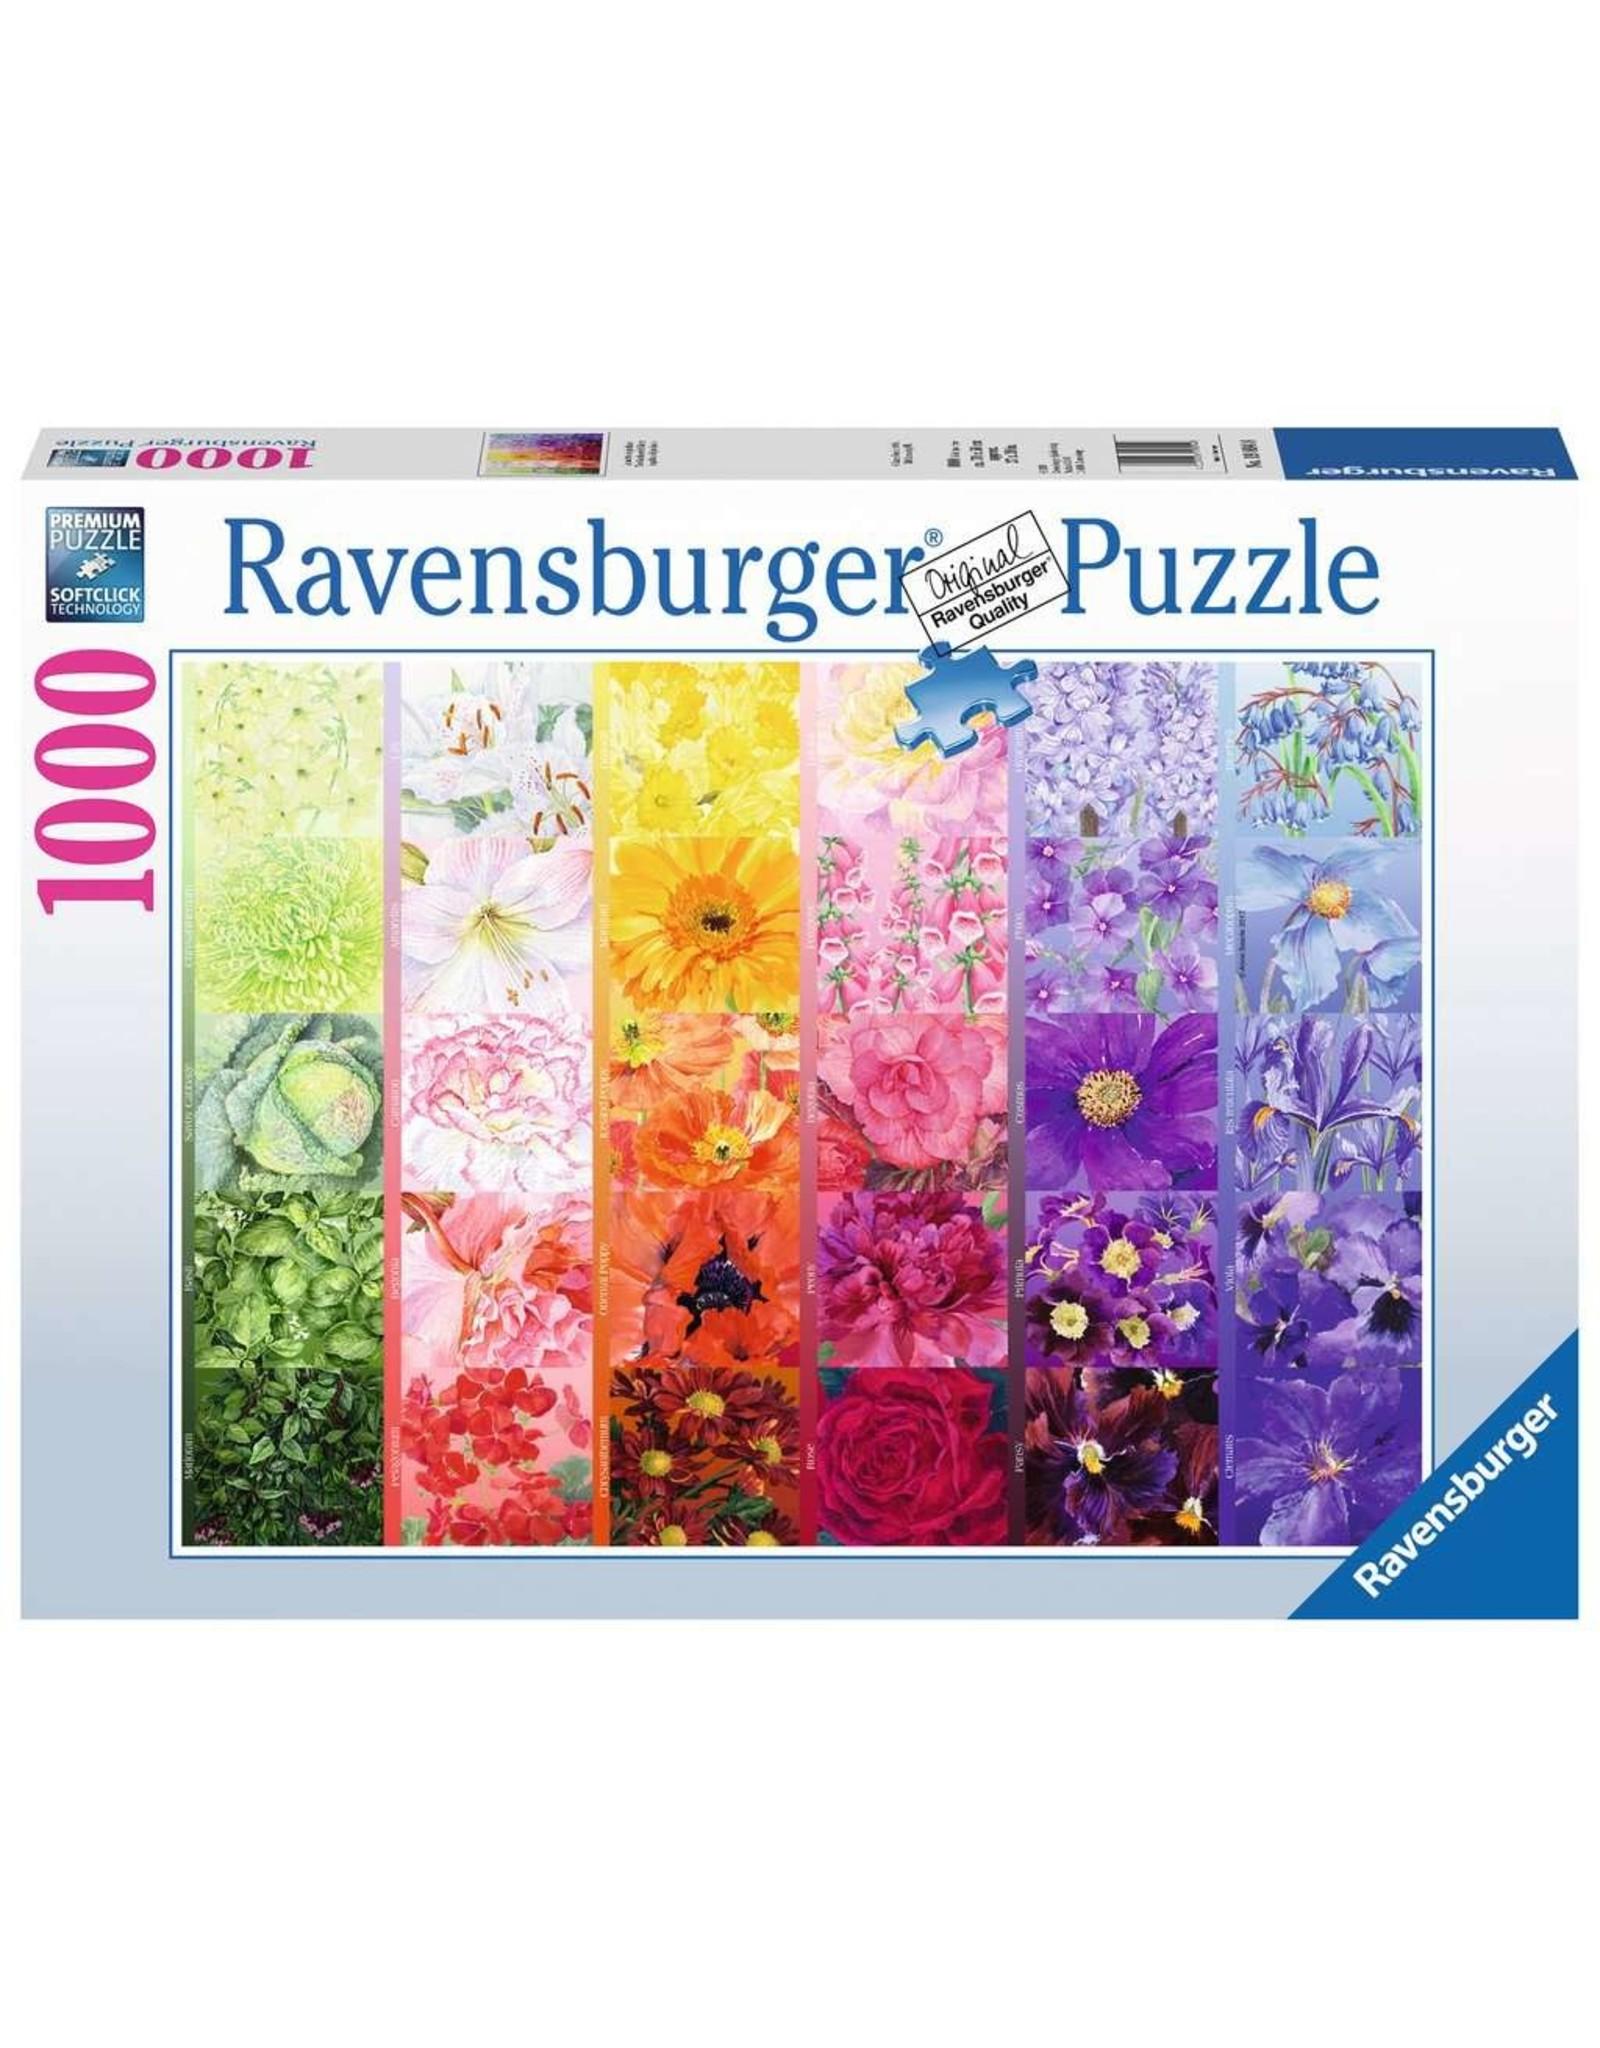 Ravensburger 1000 piece Gardener's Palette Puzzle